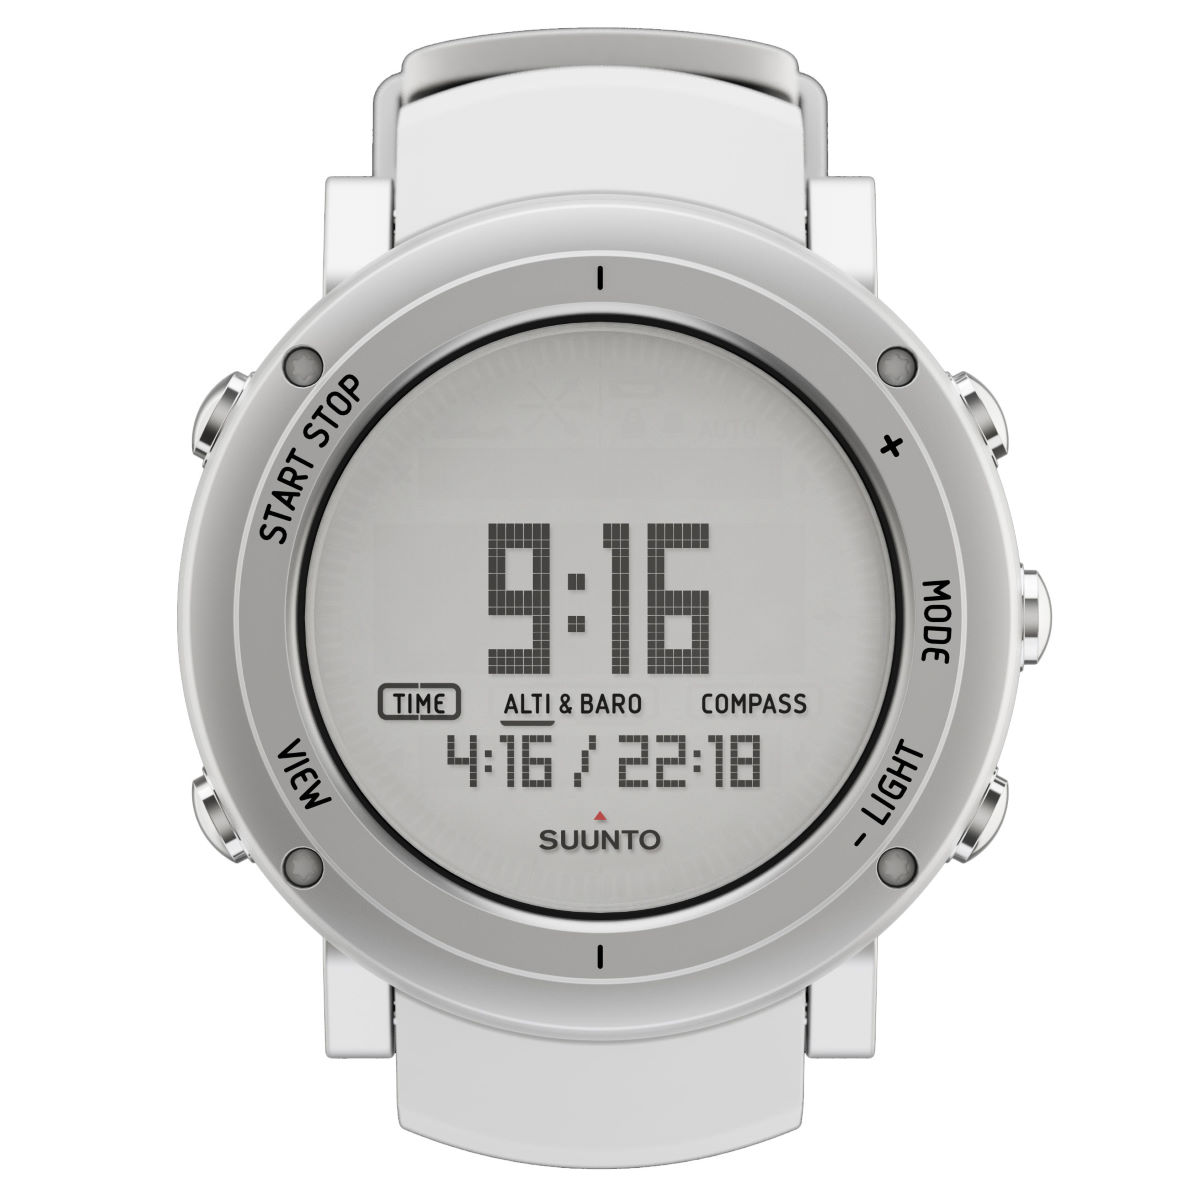 Reloj deportivo Suunto Core (aluminio) - Relojes deportivos